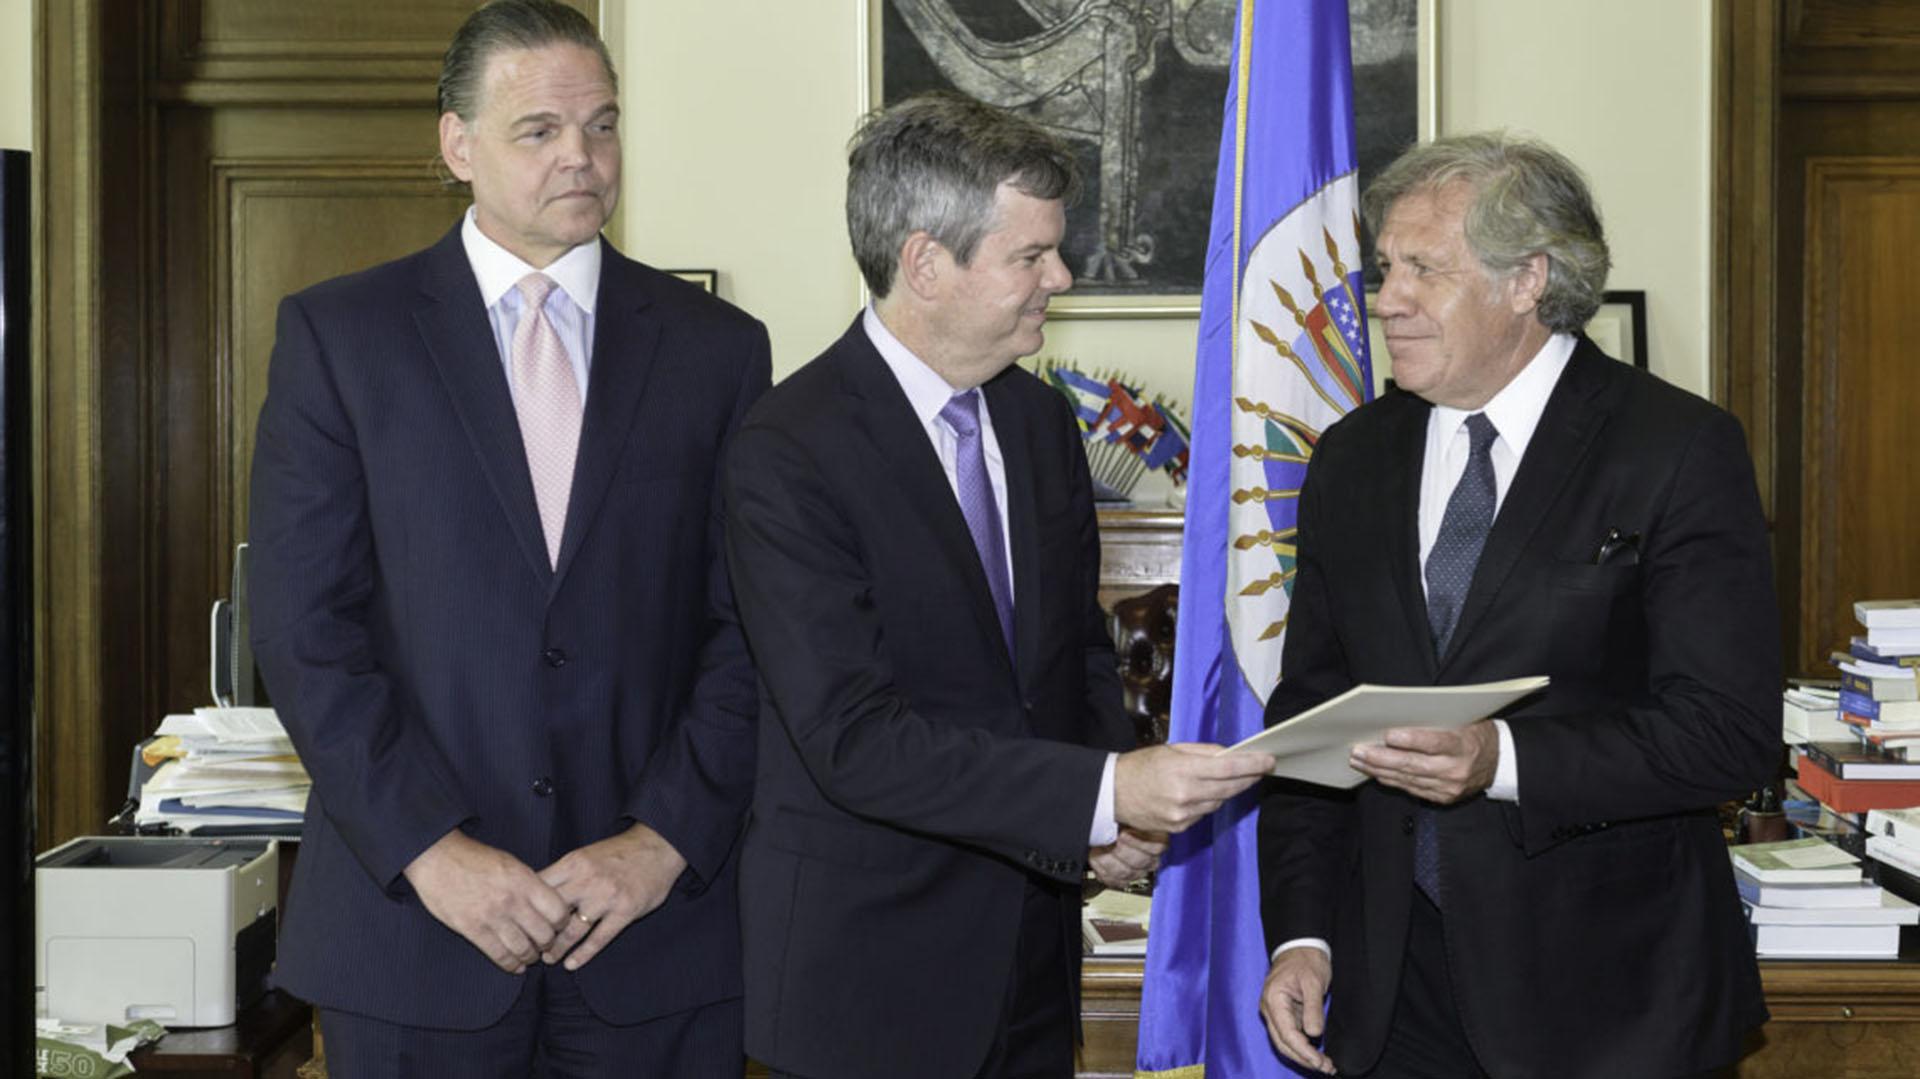 Sullivan, junto al secretario general de la OEA, Luis Almagro